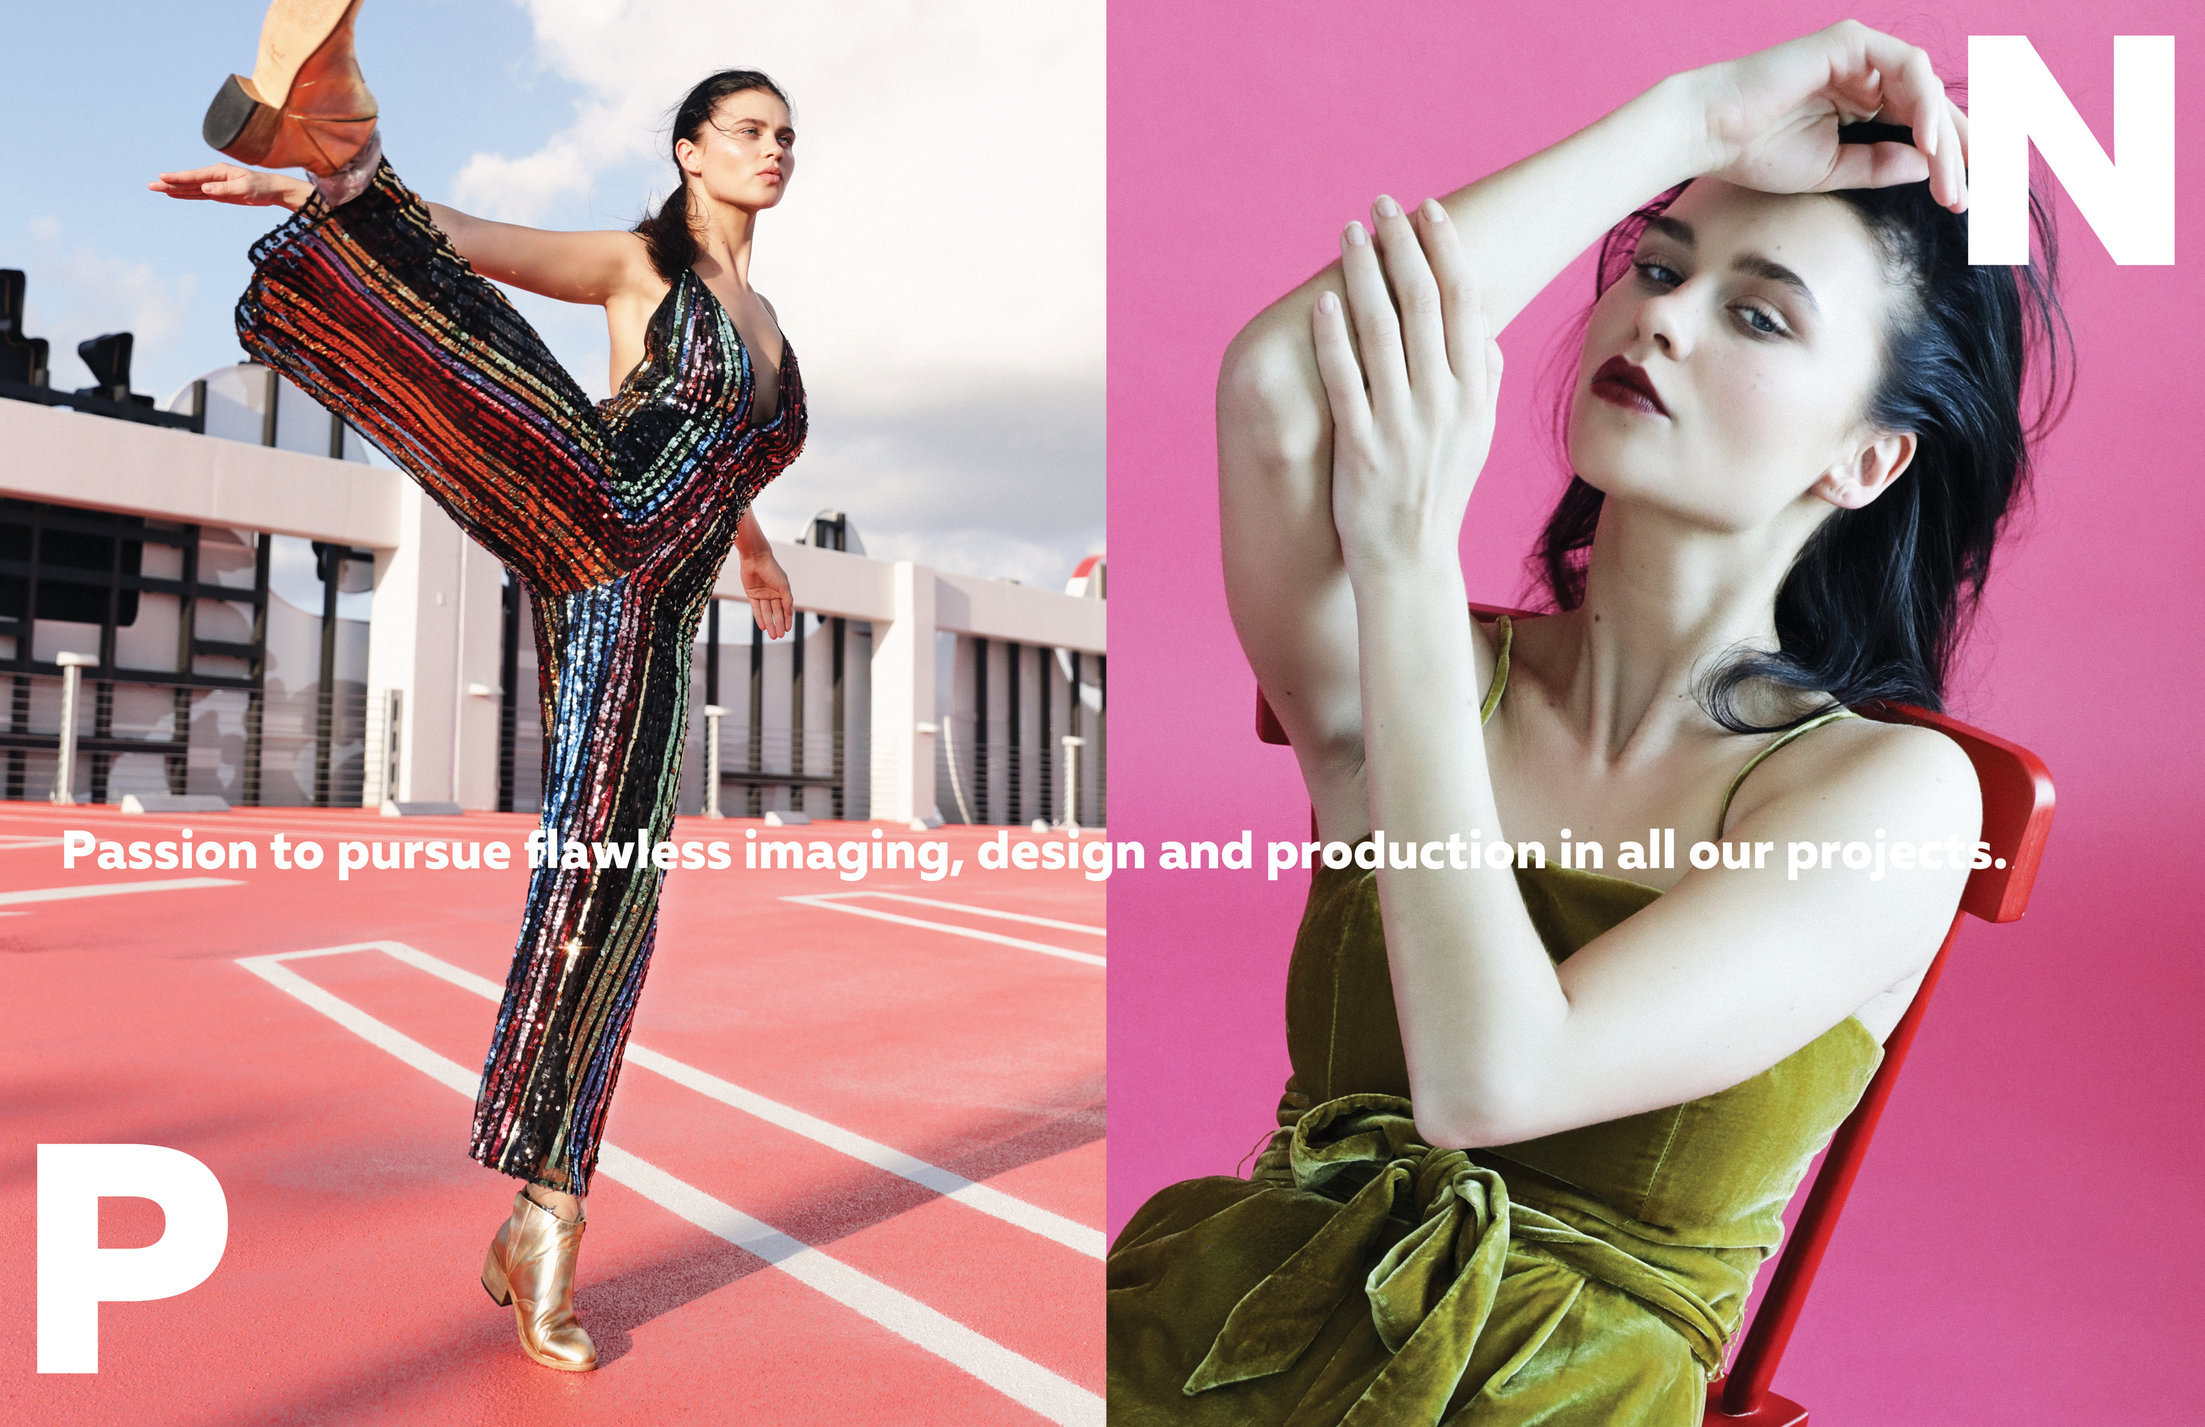 studio_b_x_production_fashion-photographer-nico-stipcianos-miami-copy-26.jpg